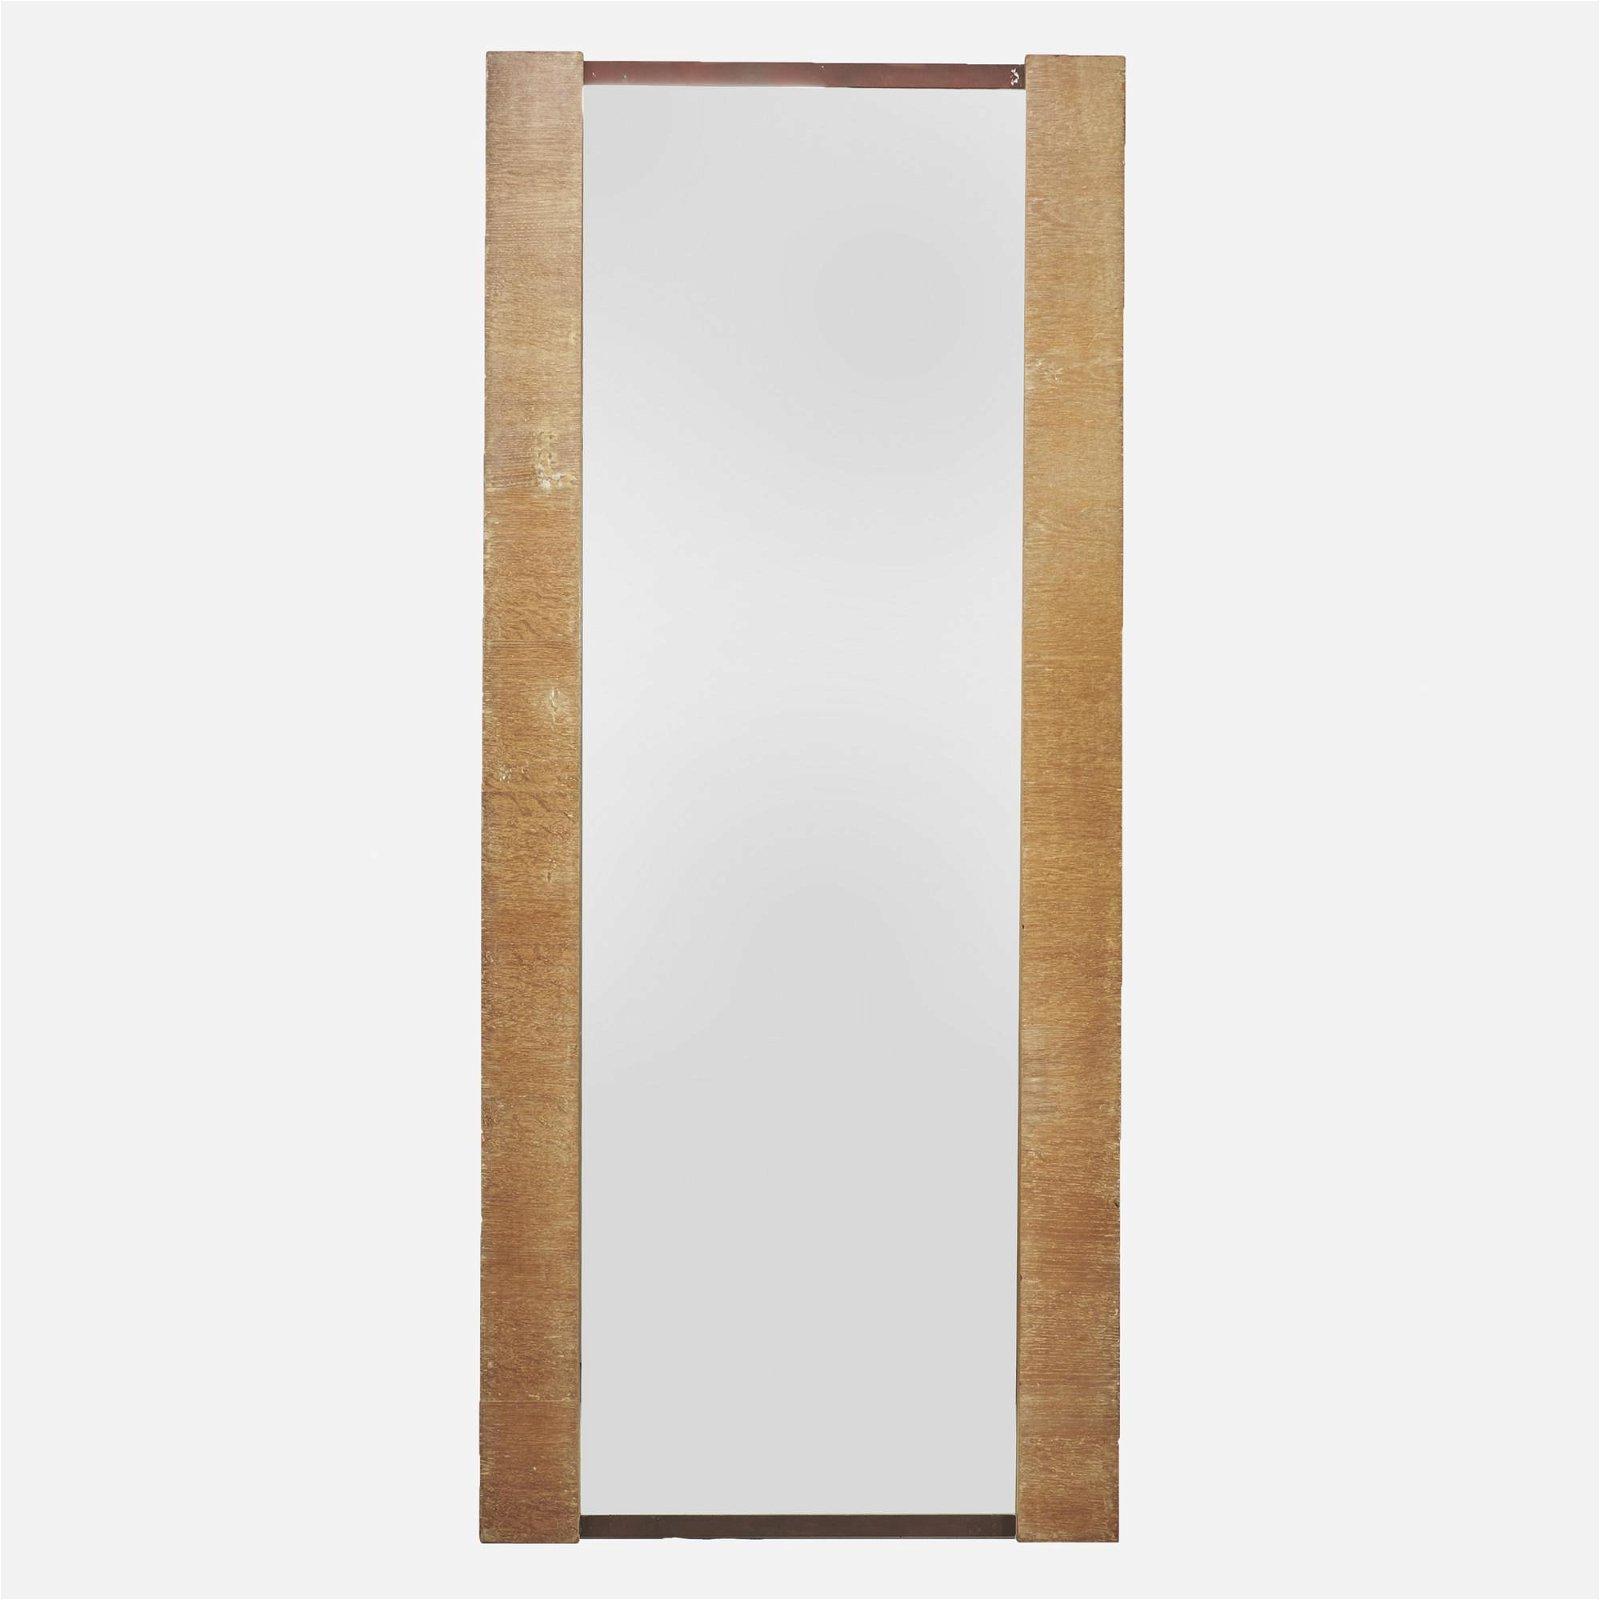 Contemporary, custom mirror